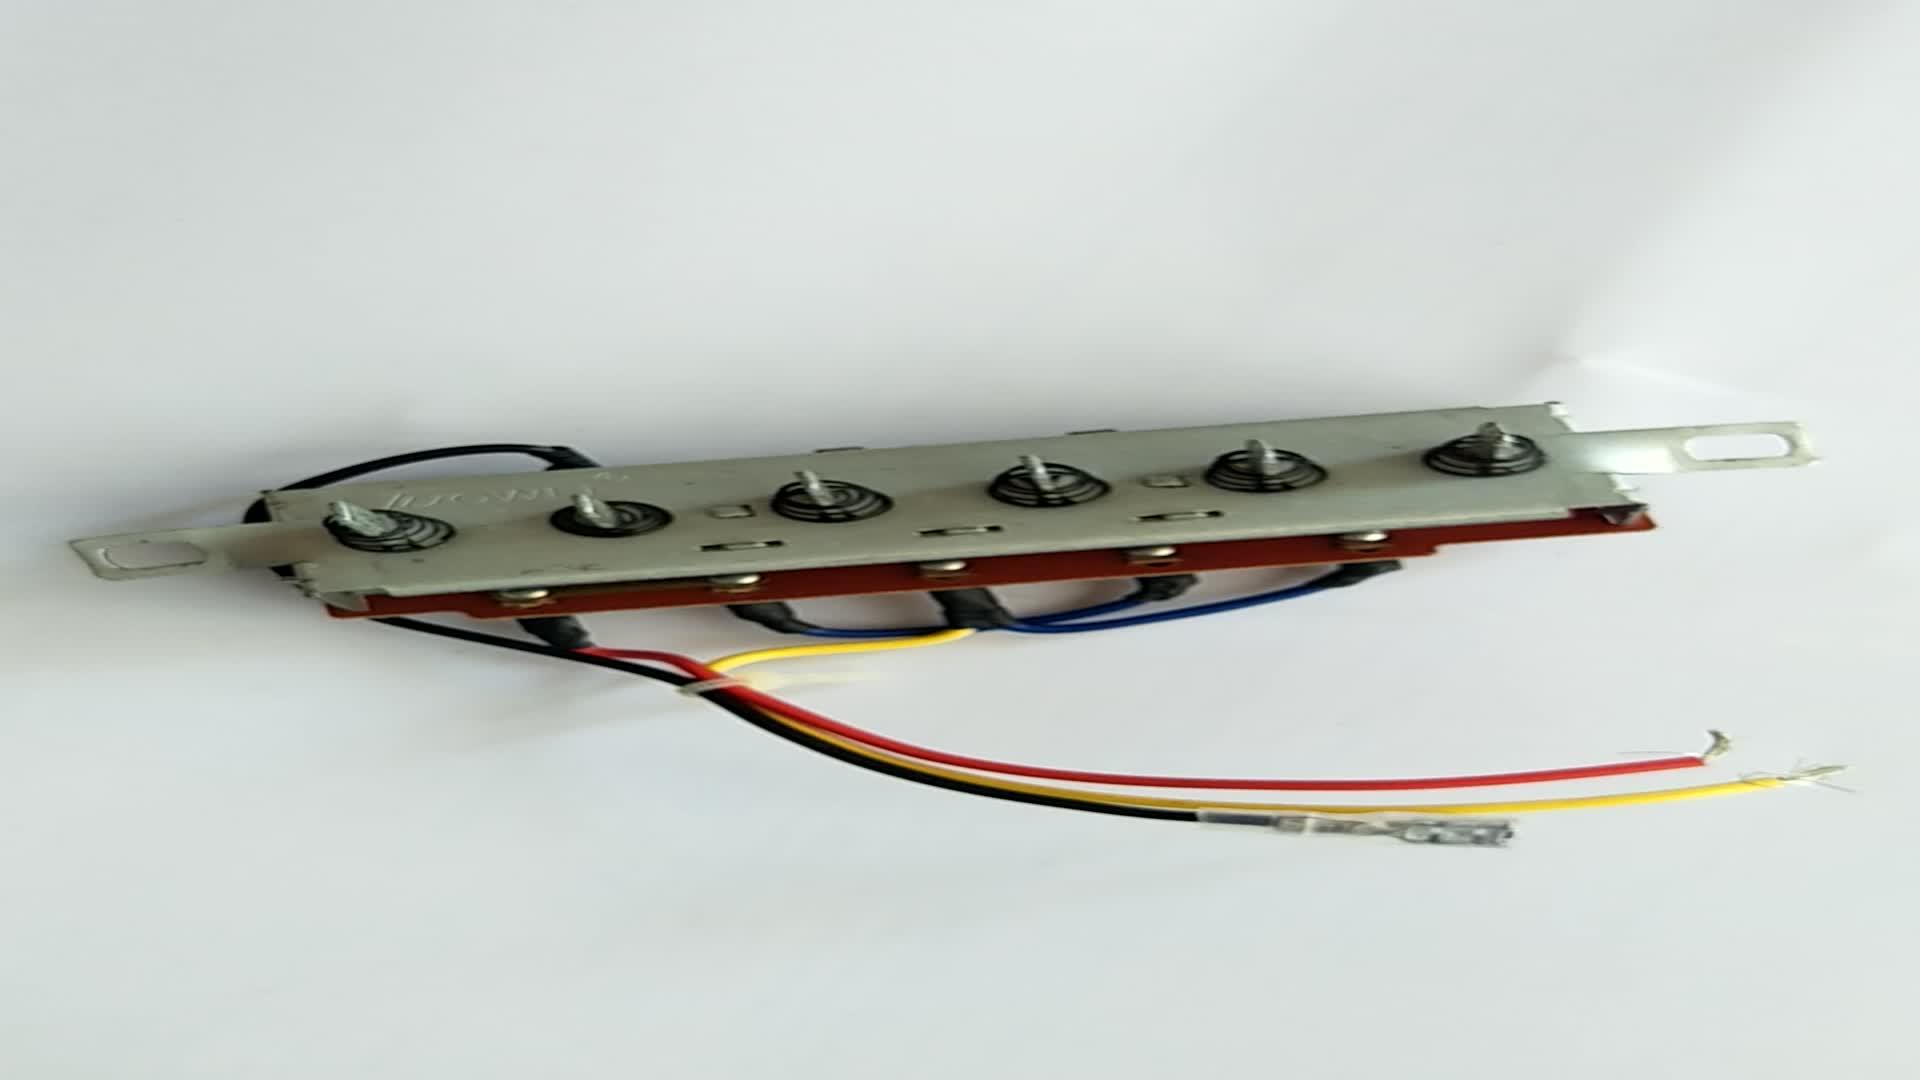 13A ~ 120 V 6A ~ 250 V Steel Blender Buah Listrik Mixer Fan 6 Posisi Piano Keyboard Switch